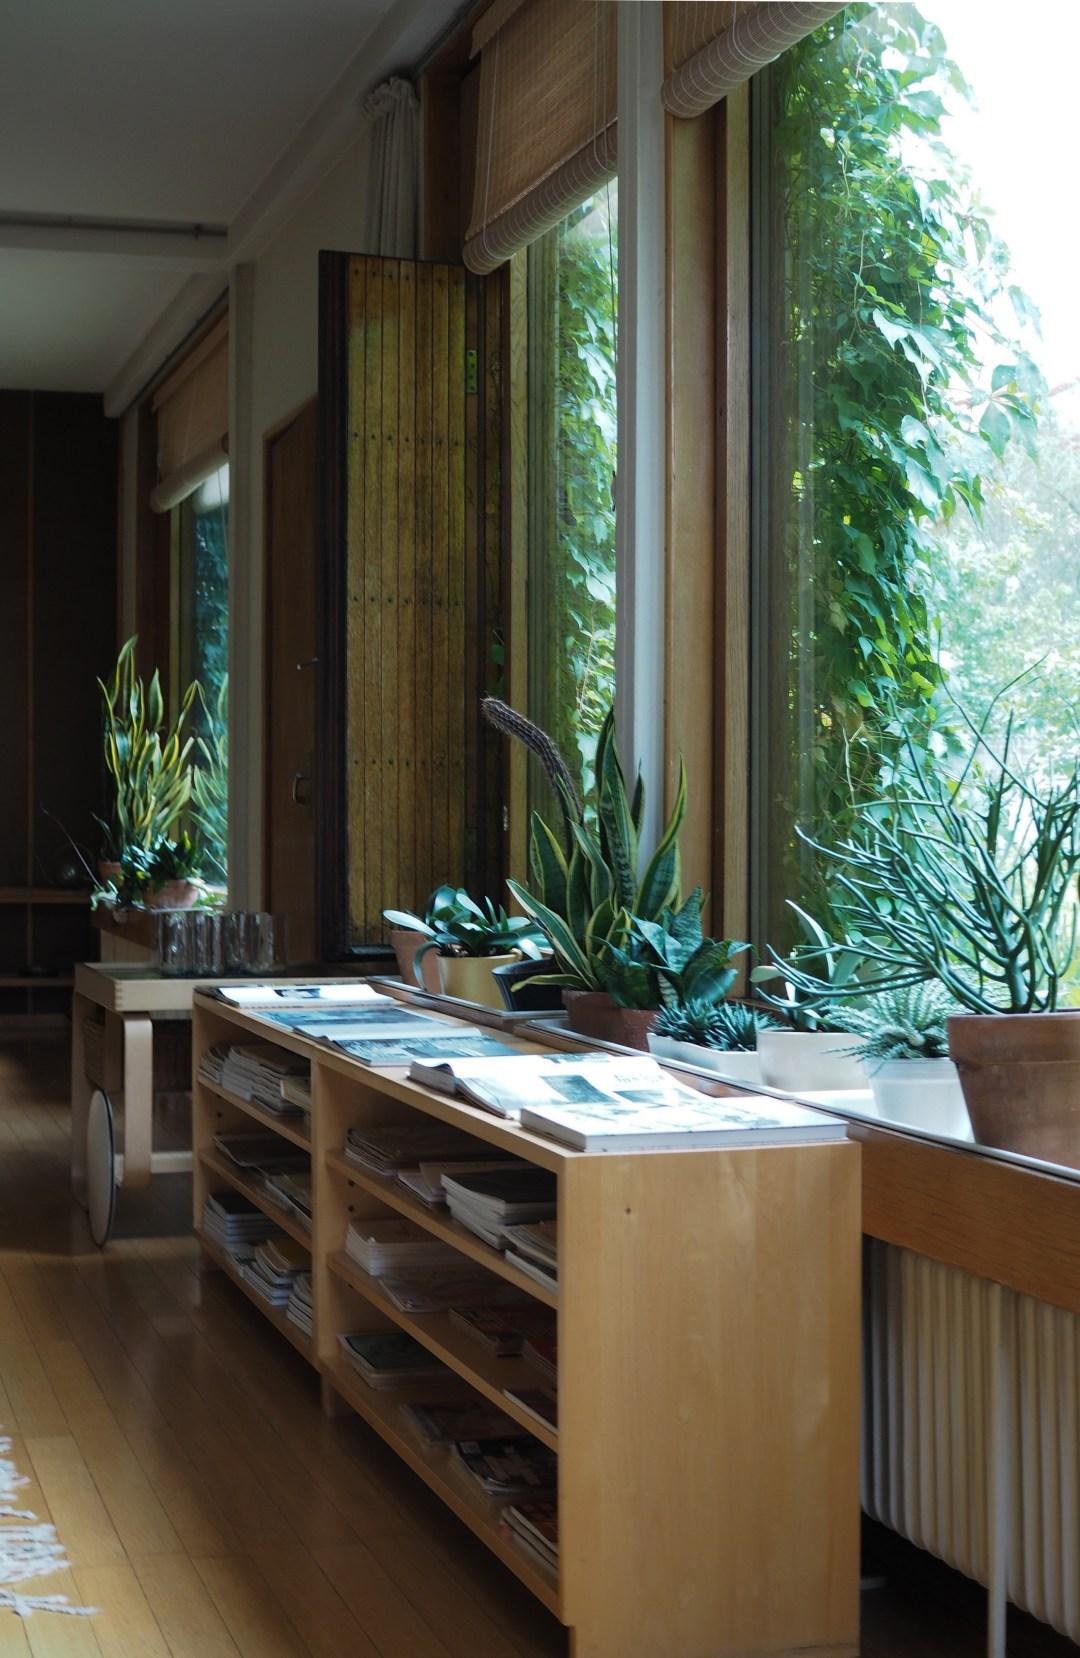 Alvar Aalto's Helsinki home